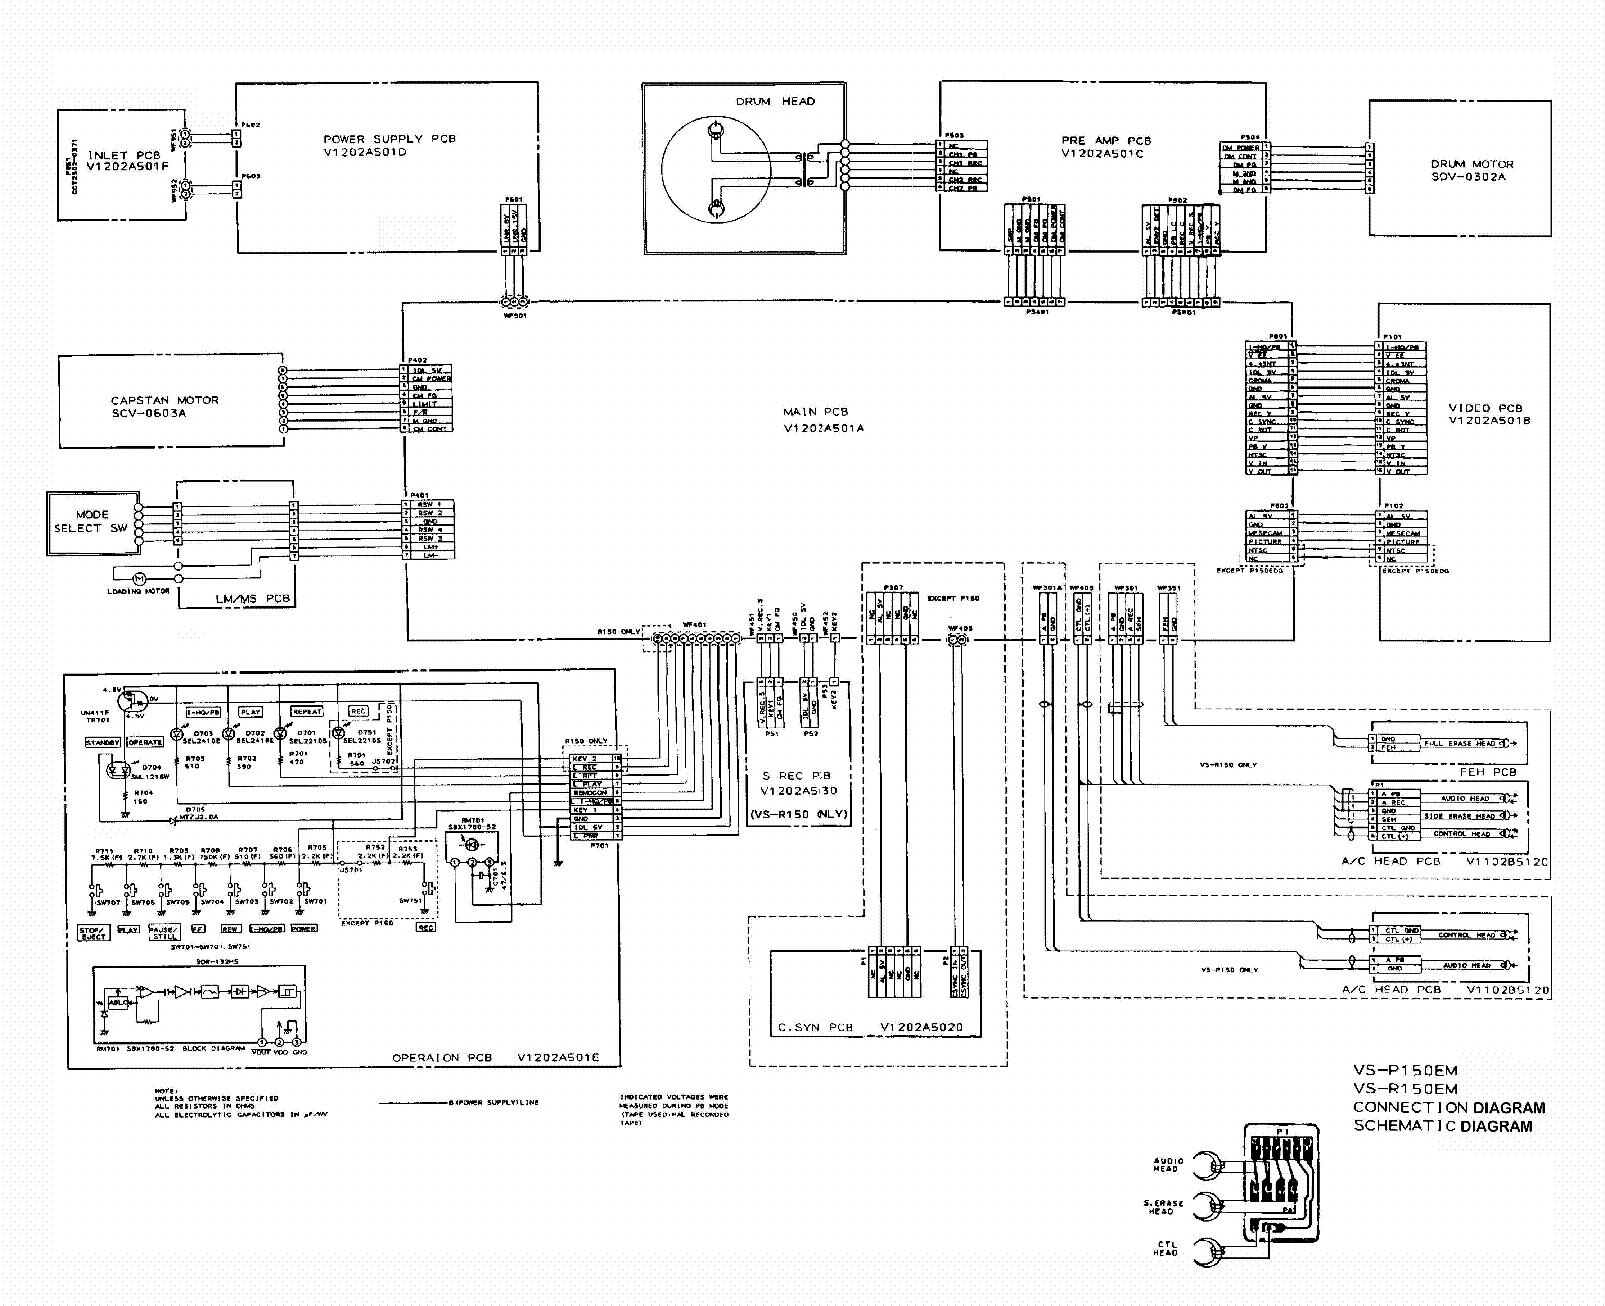 Схема видеомагнитофона Other DAEWOO VS-P150EM, VS-R150EM.